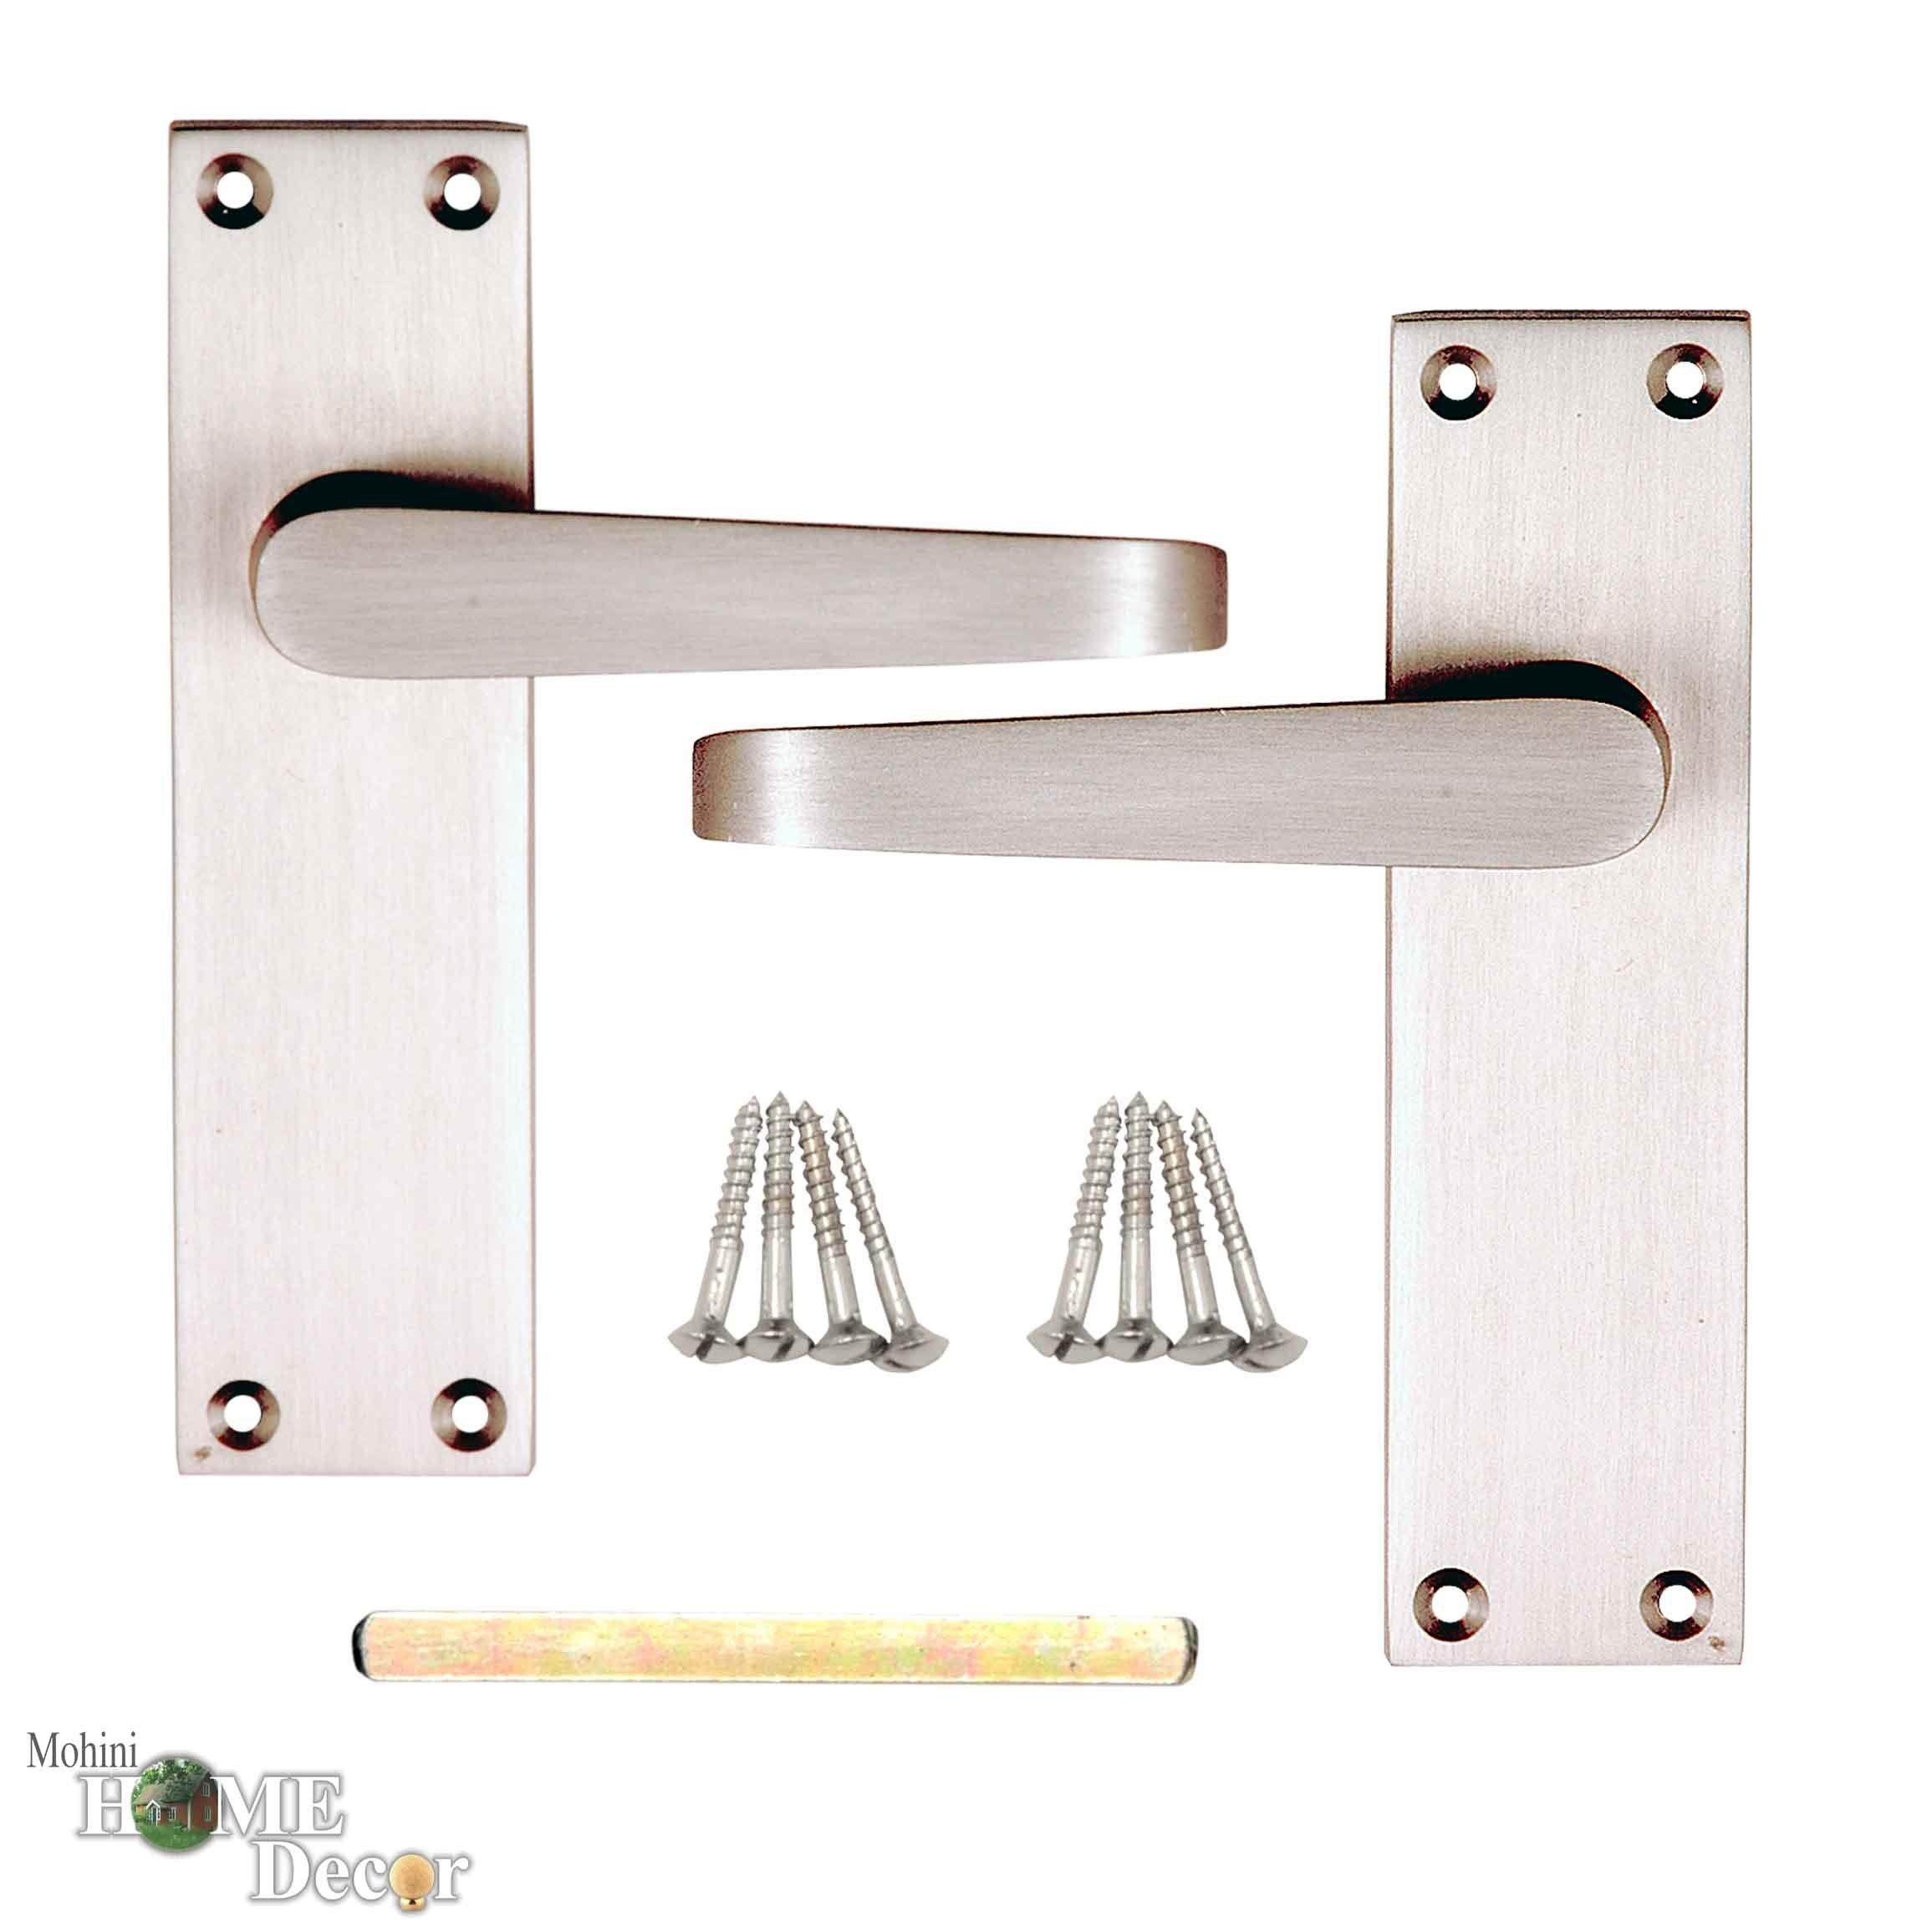 #887043 porta alavanca trava architectural ferragens porta alavanca de punho  1520 Trava Para Janelas Deslizantes